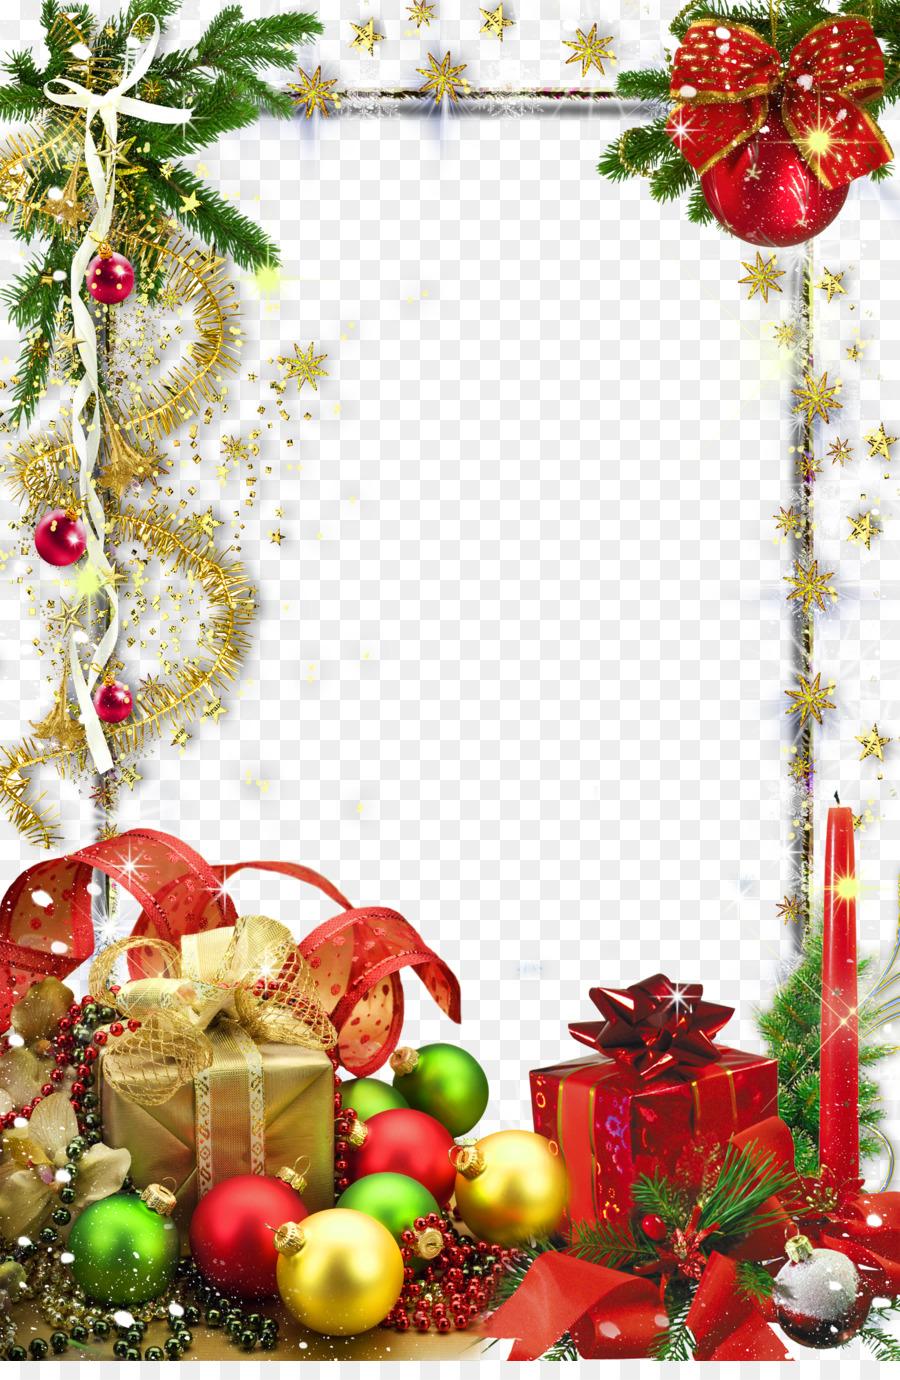 Merry Christmas 2016 Picture Frames Christmas and holiday season ...